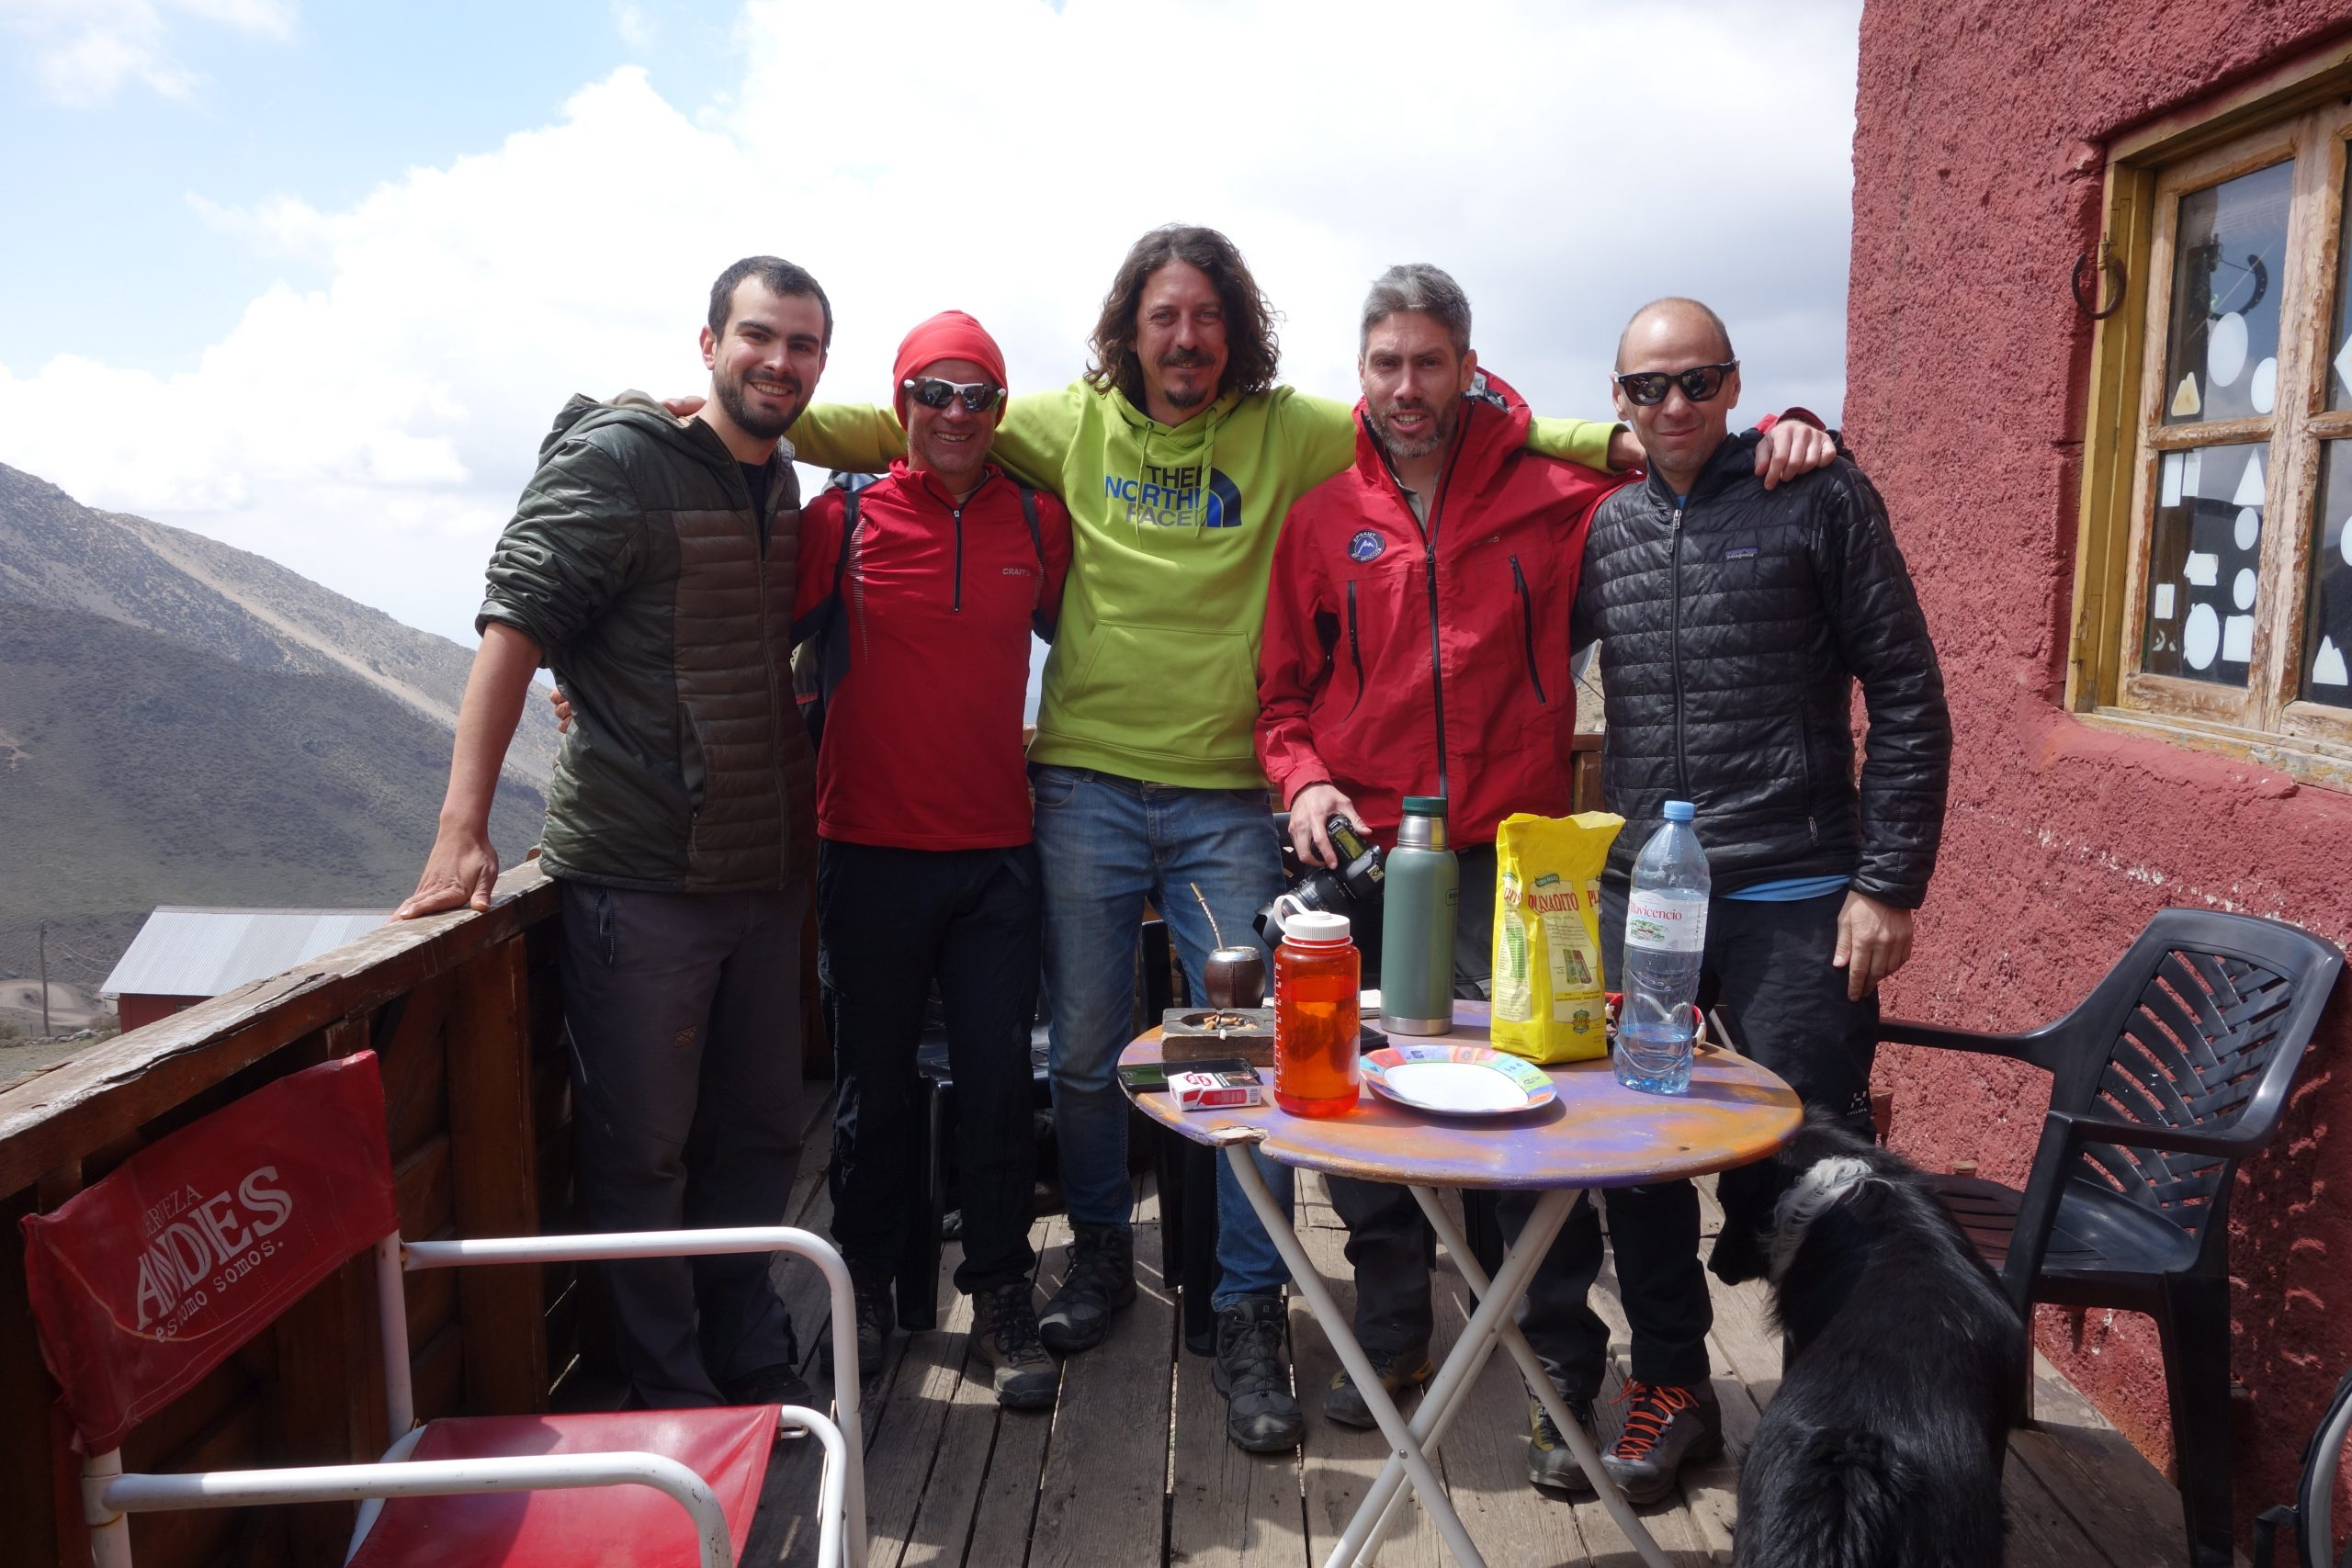 Radreise Südamerika 2019 - Gruppenbild am Refugio Mausy (3.000m)